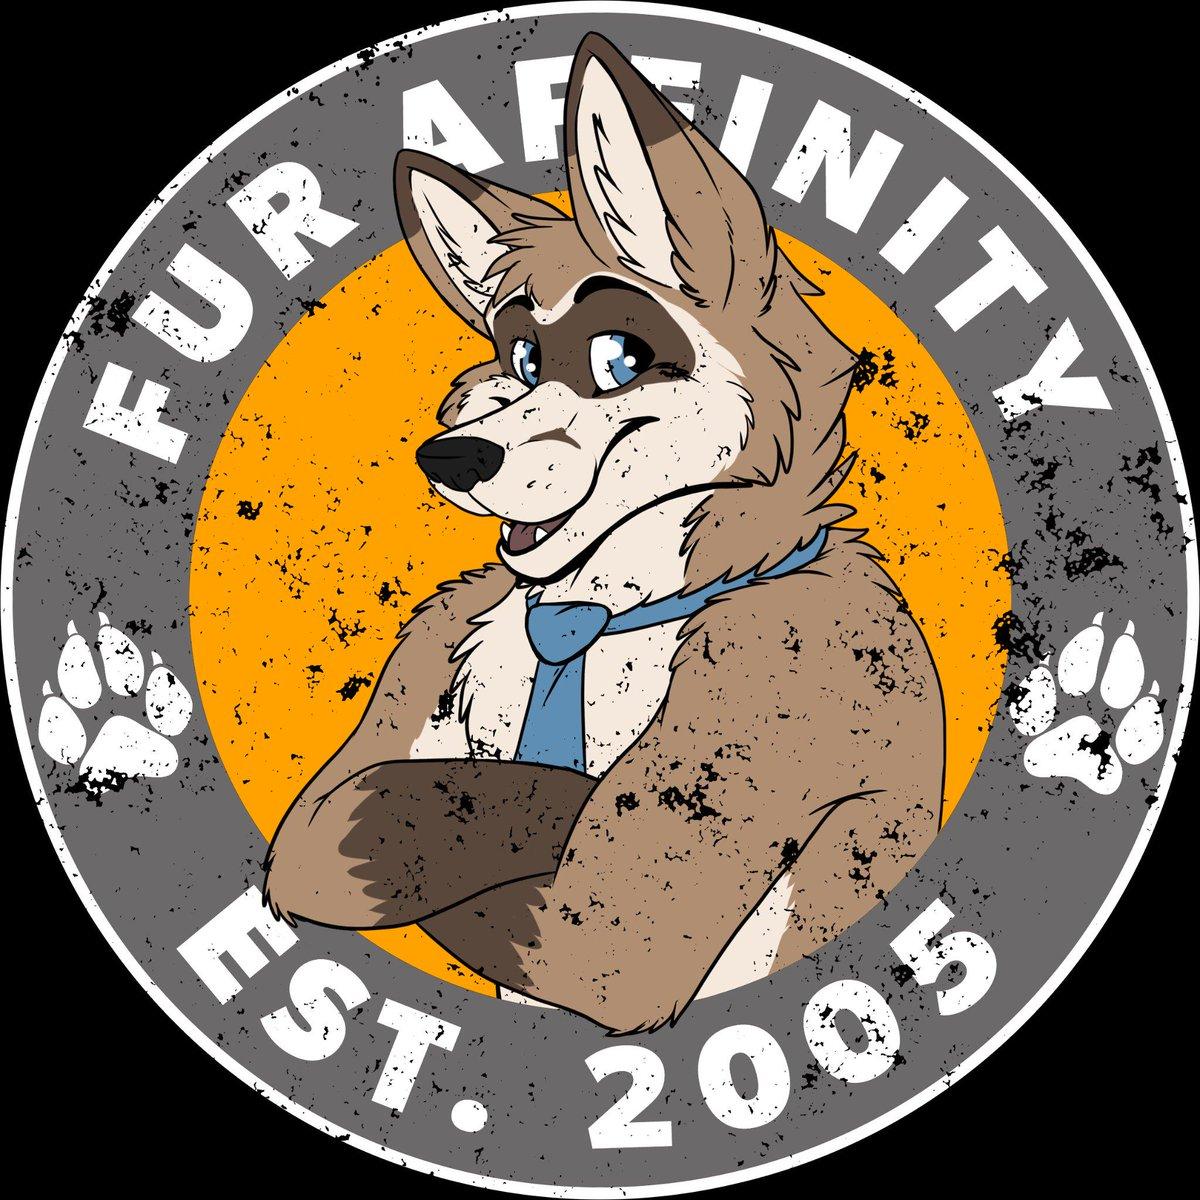 Fur Affinity on Twitter: